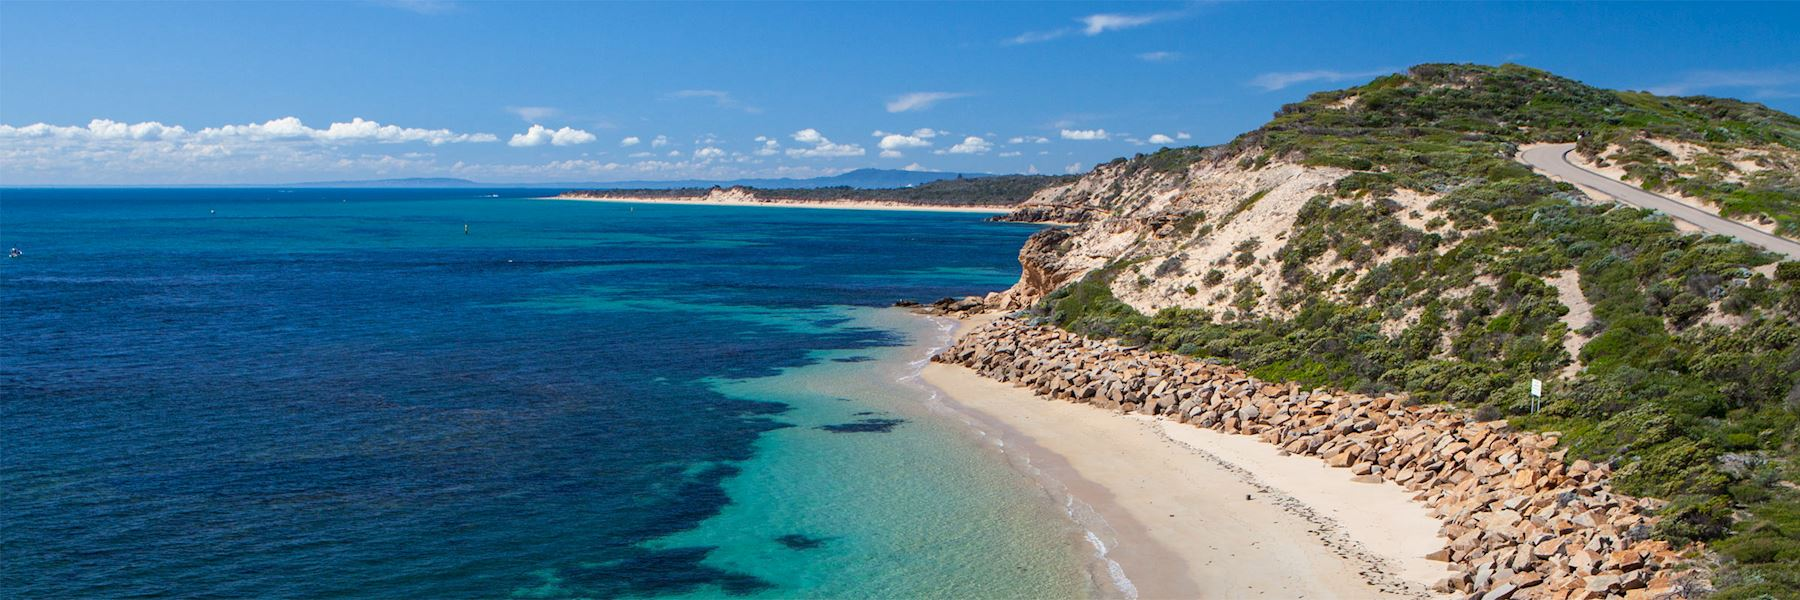 Visit Mornington Peninsula, Australia